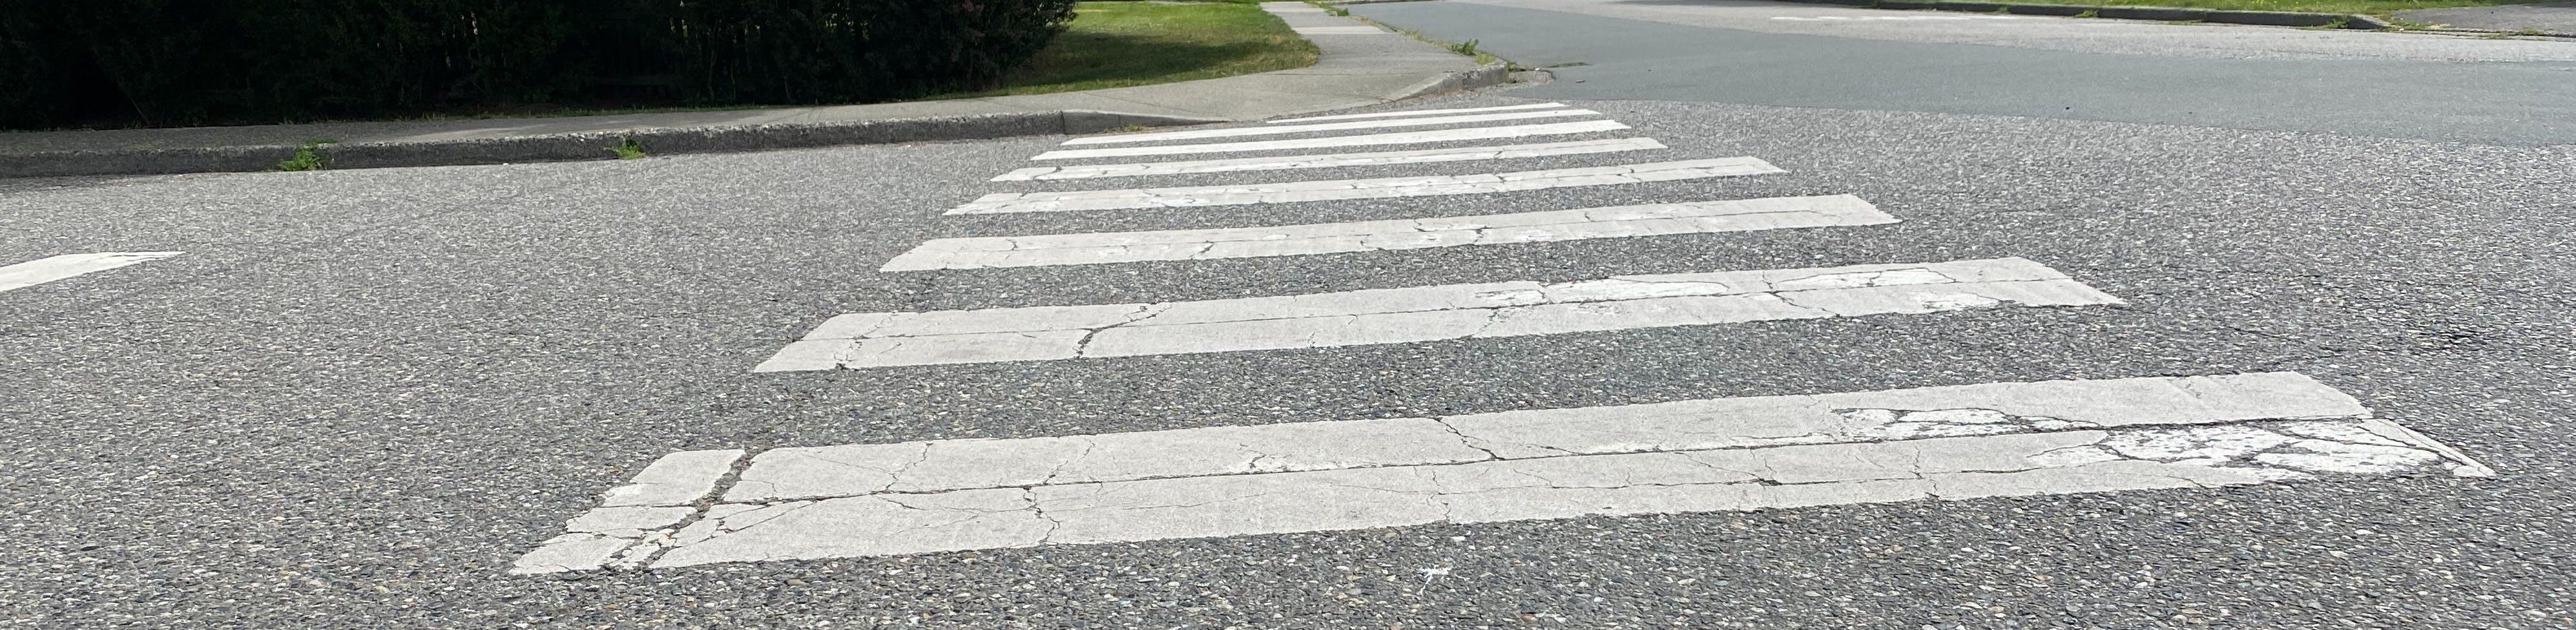 A zebra crosswalk